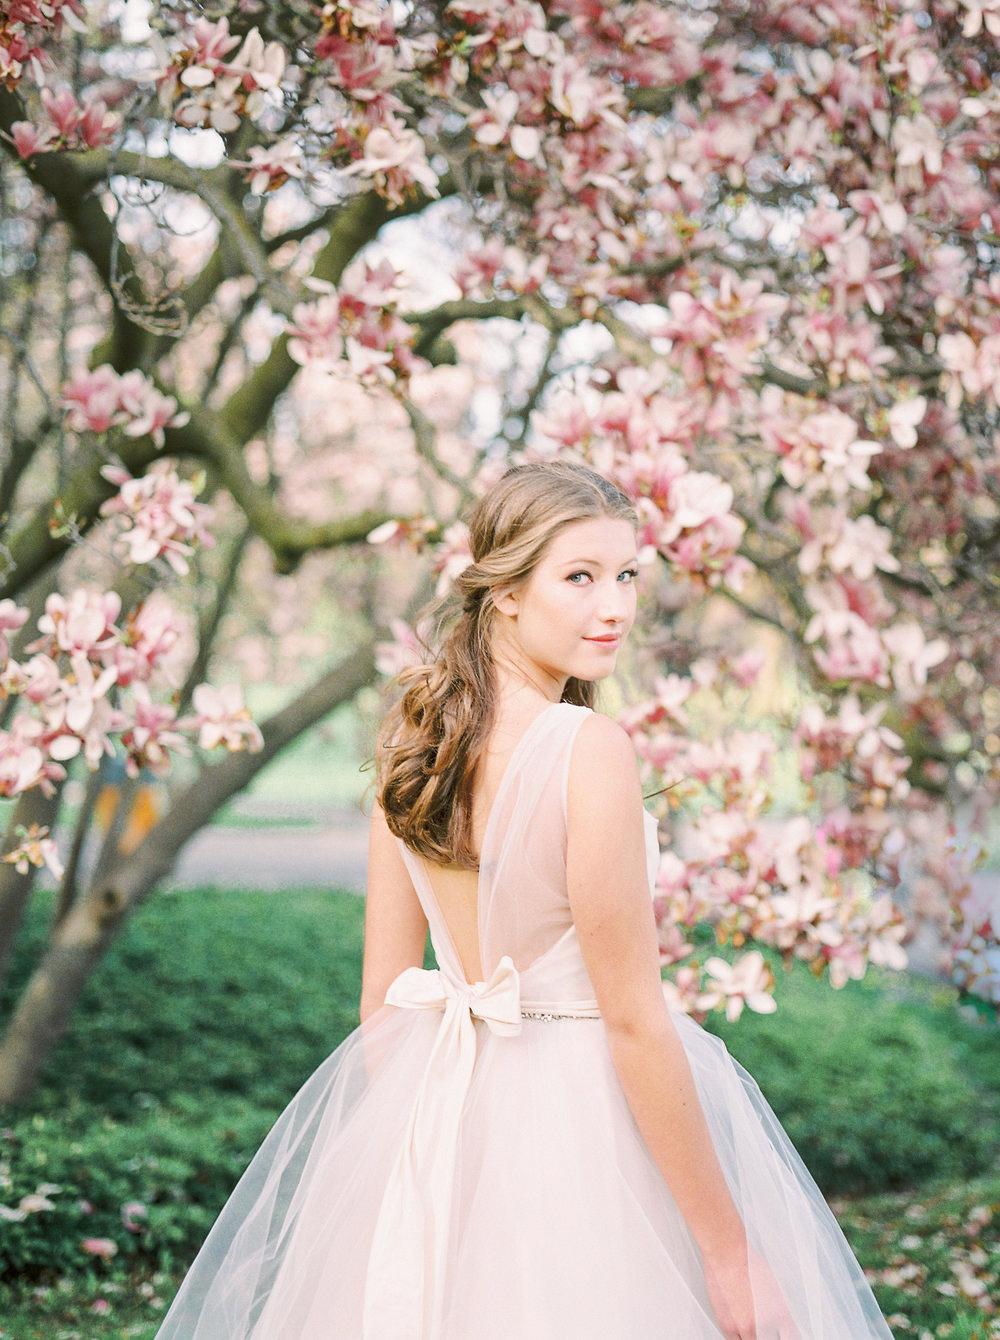 julia-park-photography-vineyard-bride-swish-list-niagara-on-the-lake-wedding-editorial-7.jpg